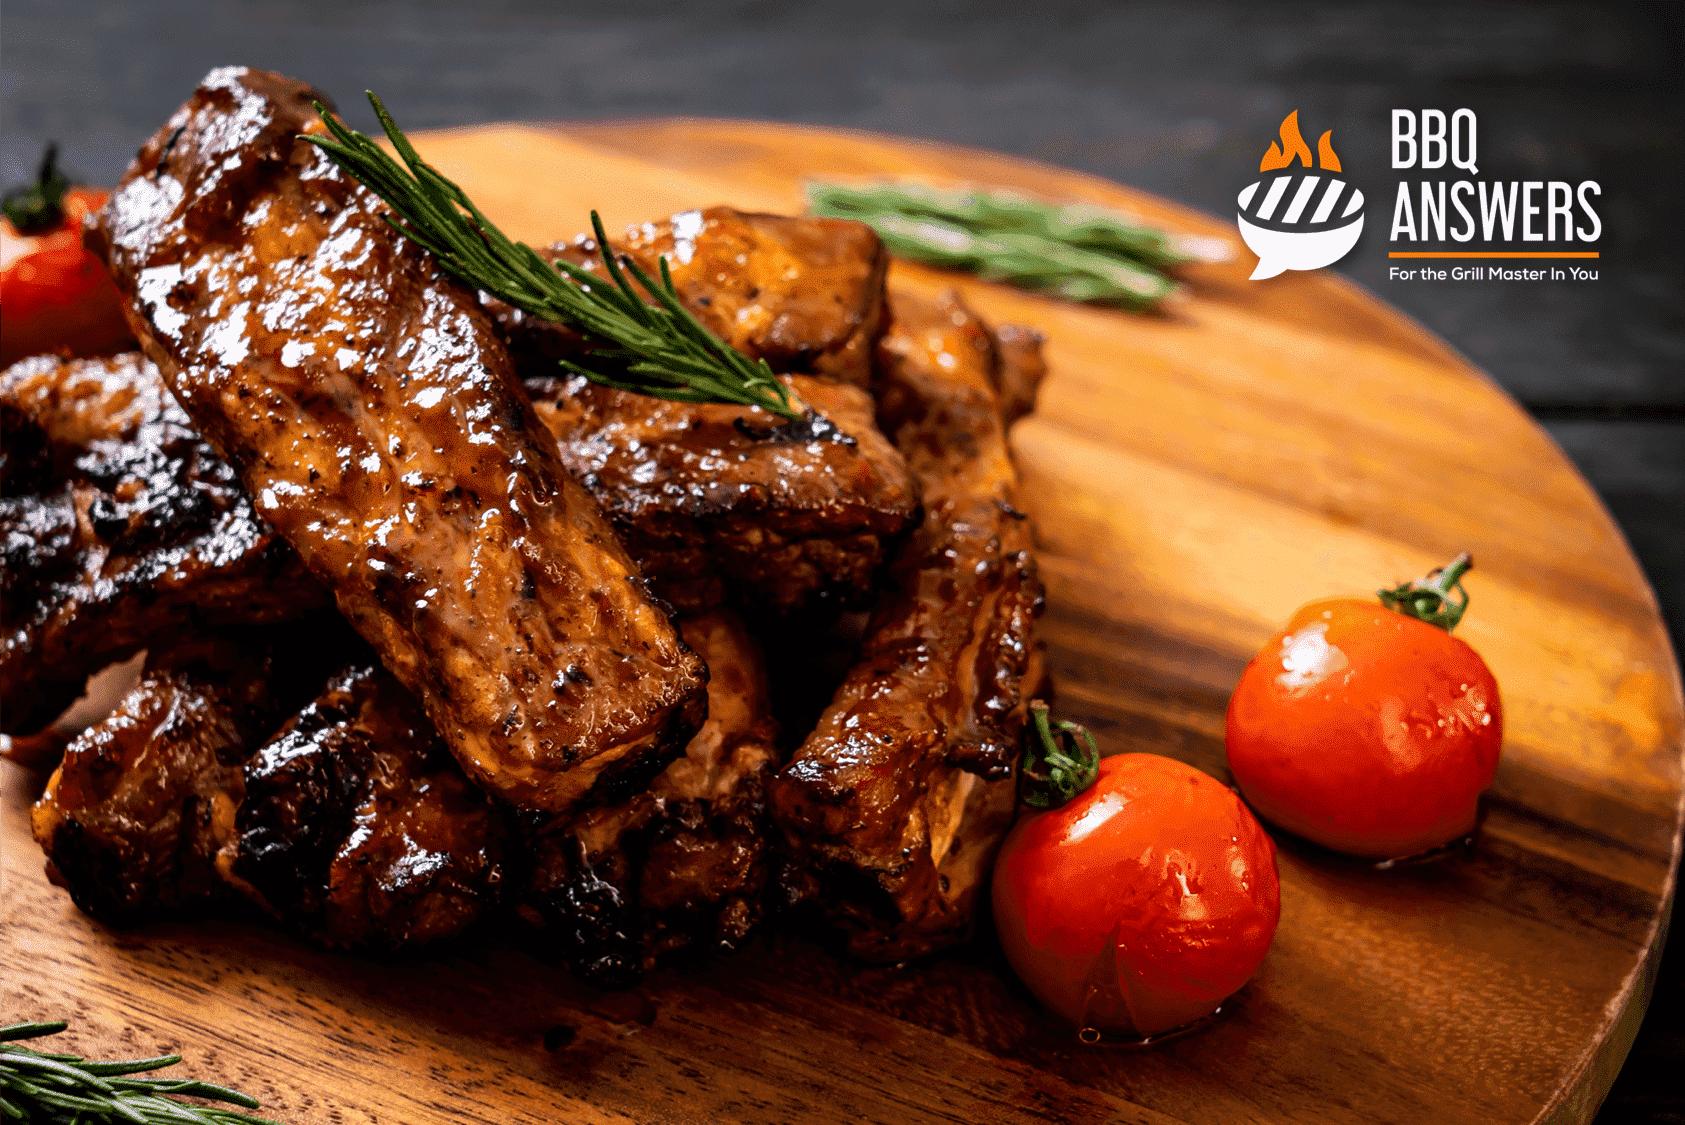 Must-Try Vegan BBQ Rib Recipes